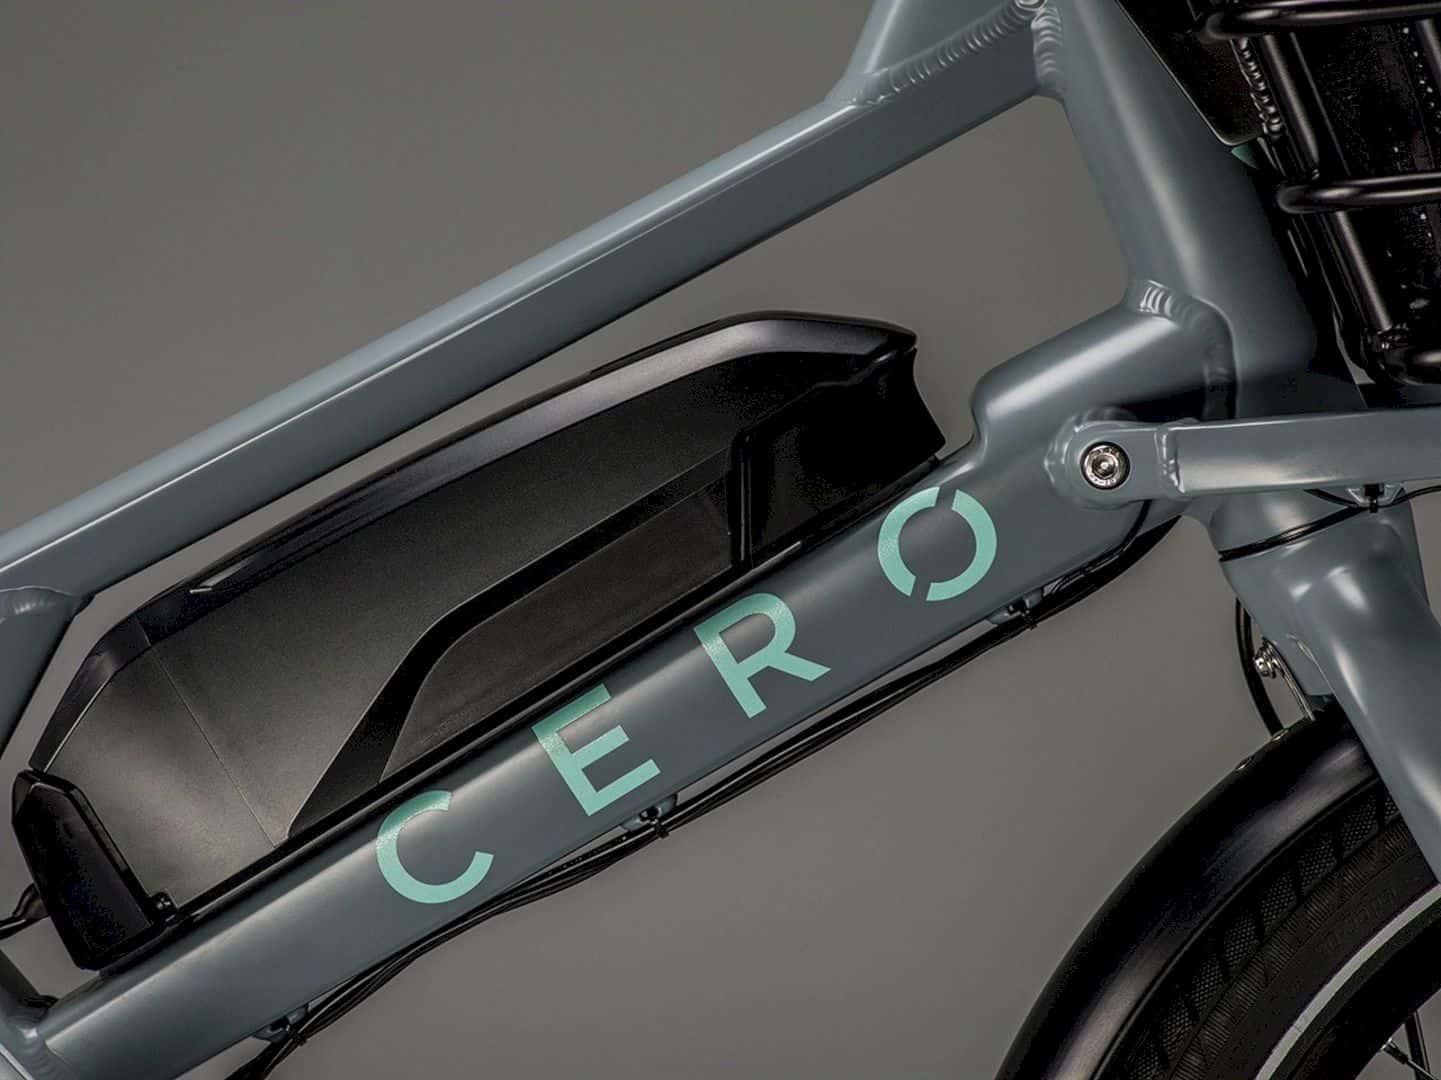 Cero One 6